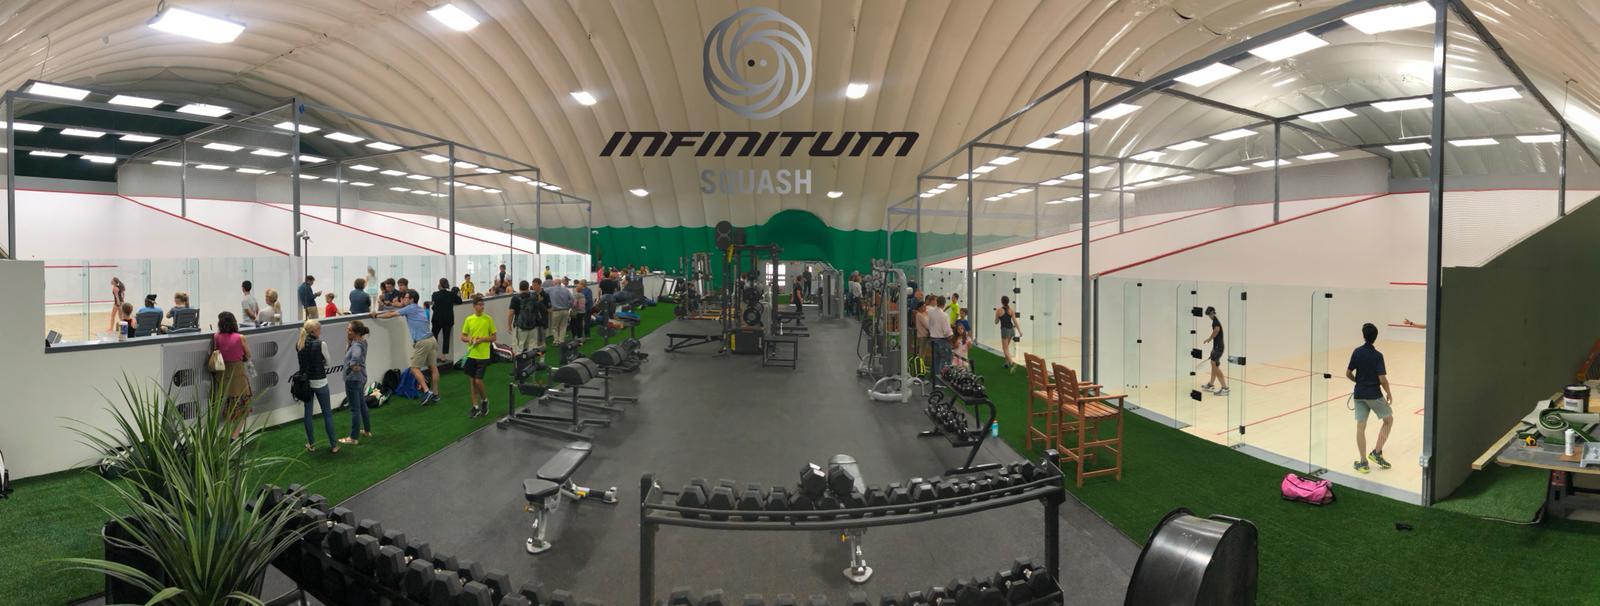 Infinitum_squash_facility.jpg